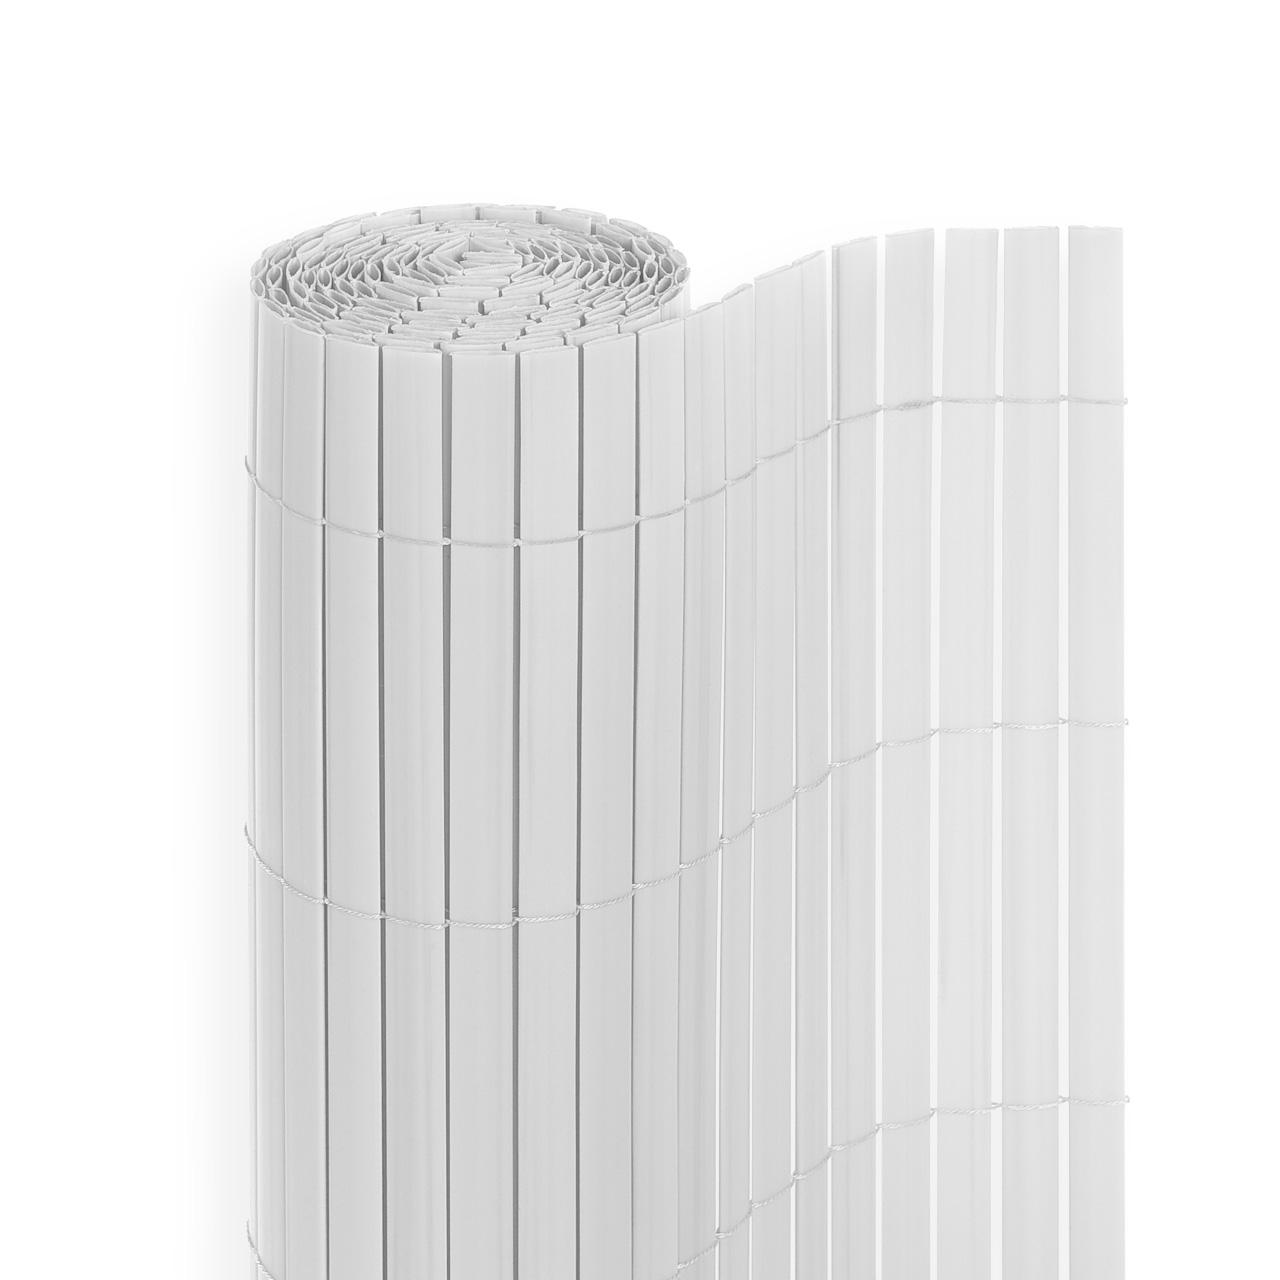 Sichtschutz Zaun Matte Windschutz Balkon Markise PVC